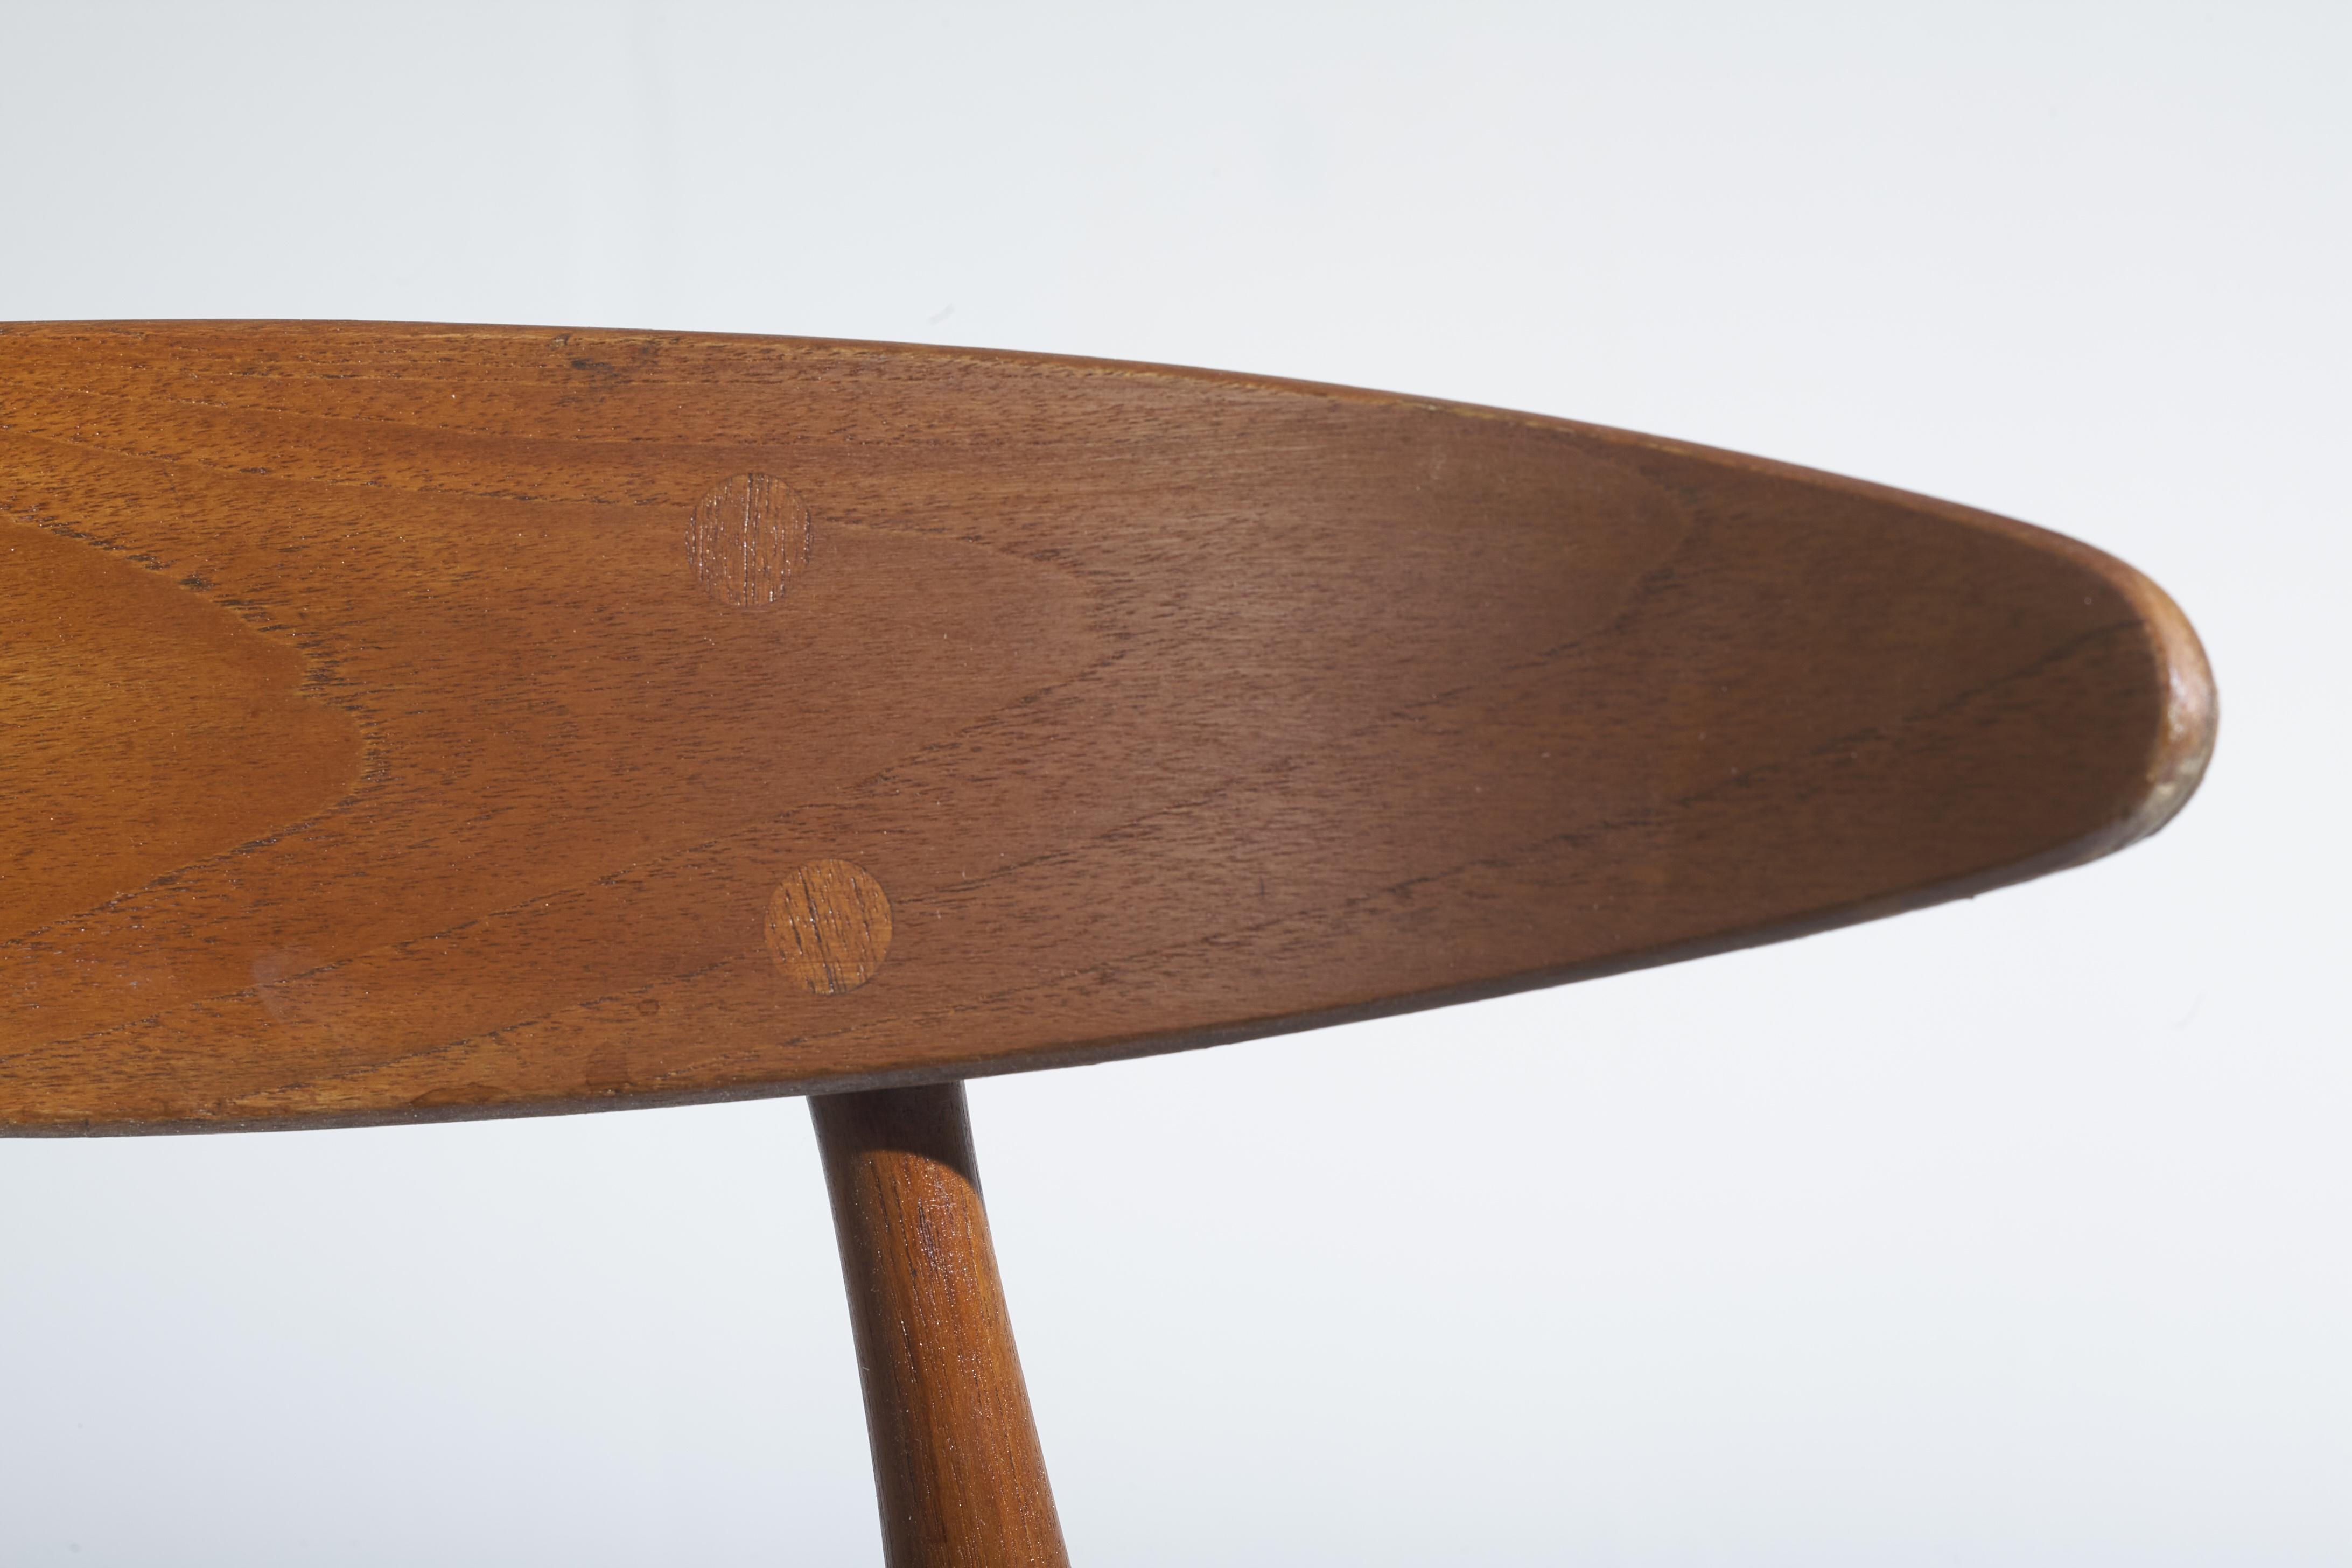 Set of four CH 33 chairs - Hans J. Wegner for Carl Hansen & Son